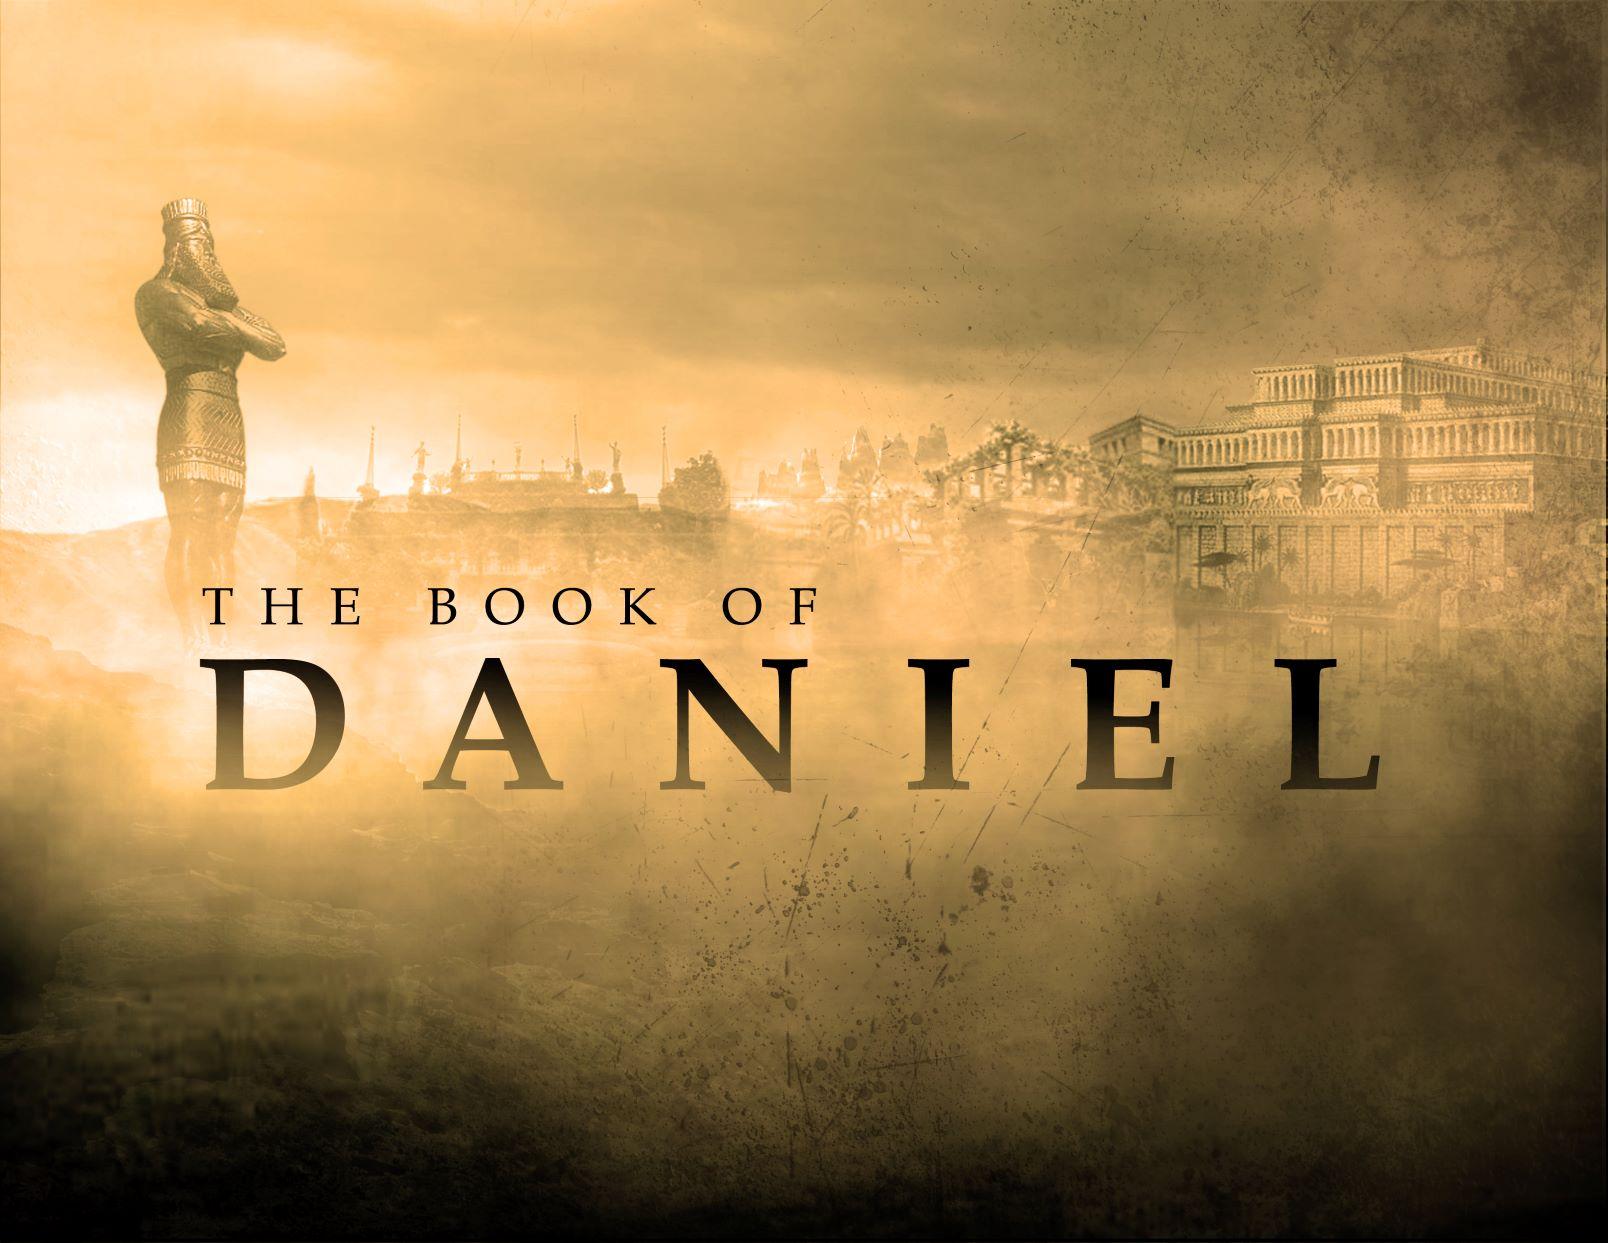 Bible Study with Virginia McCarron exploring the Book of Daniel